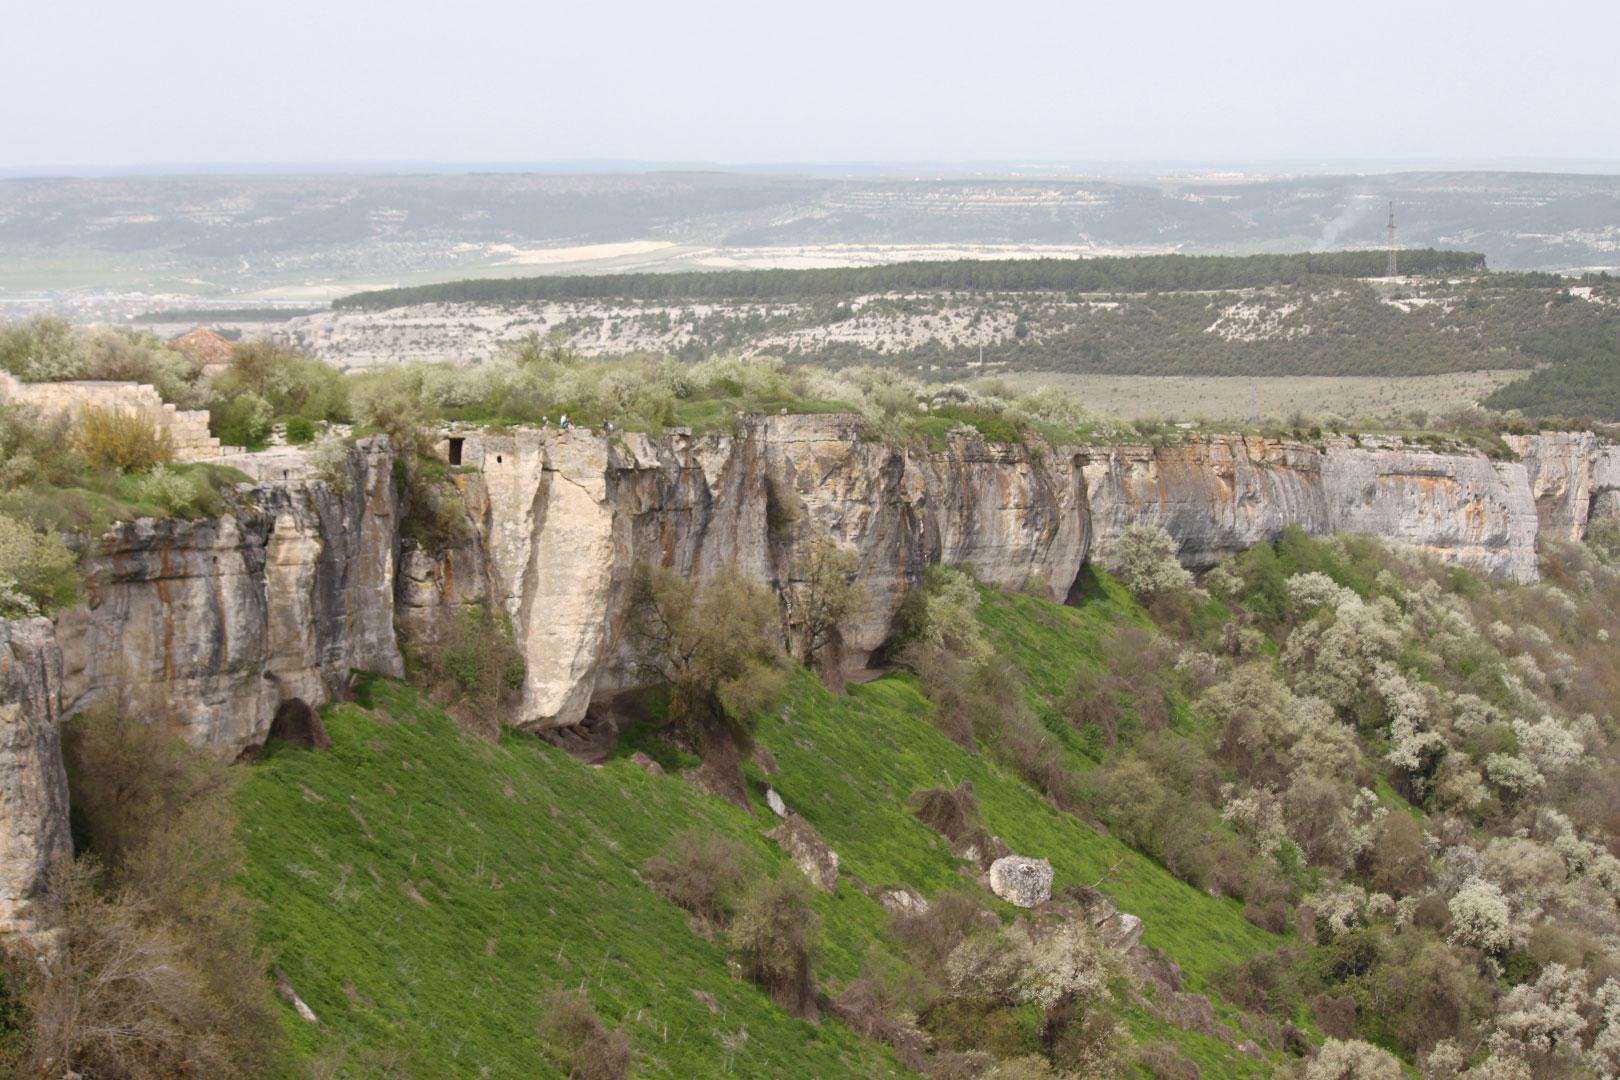 Южный склон долины Биюк-Ашлама-Дере